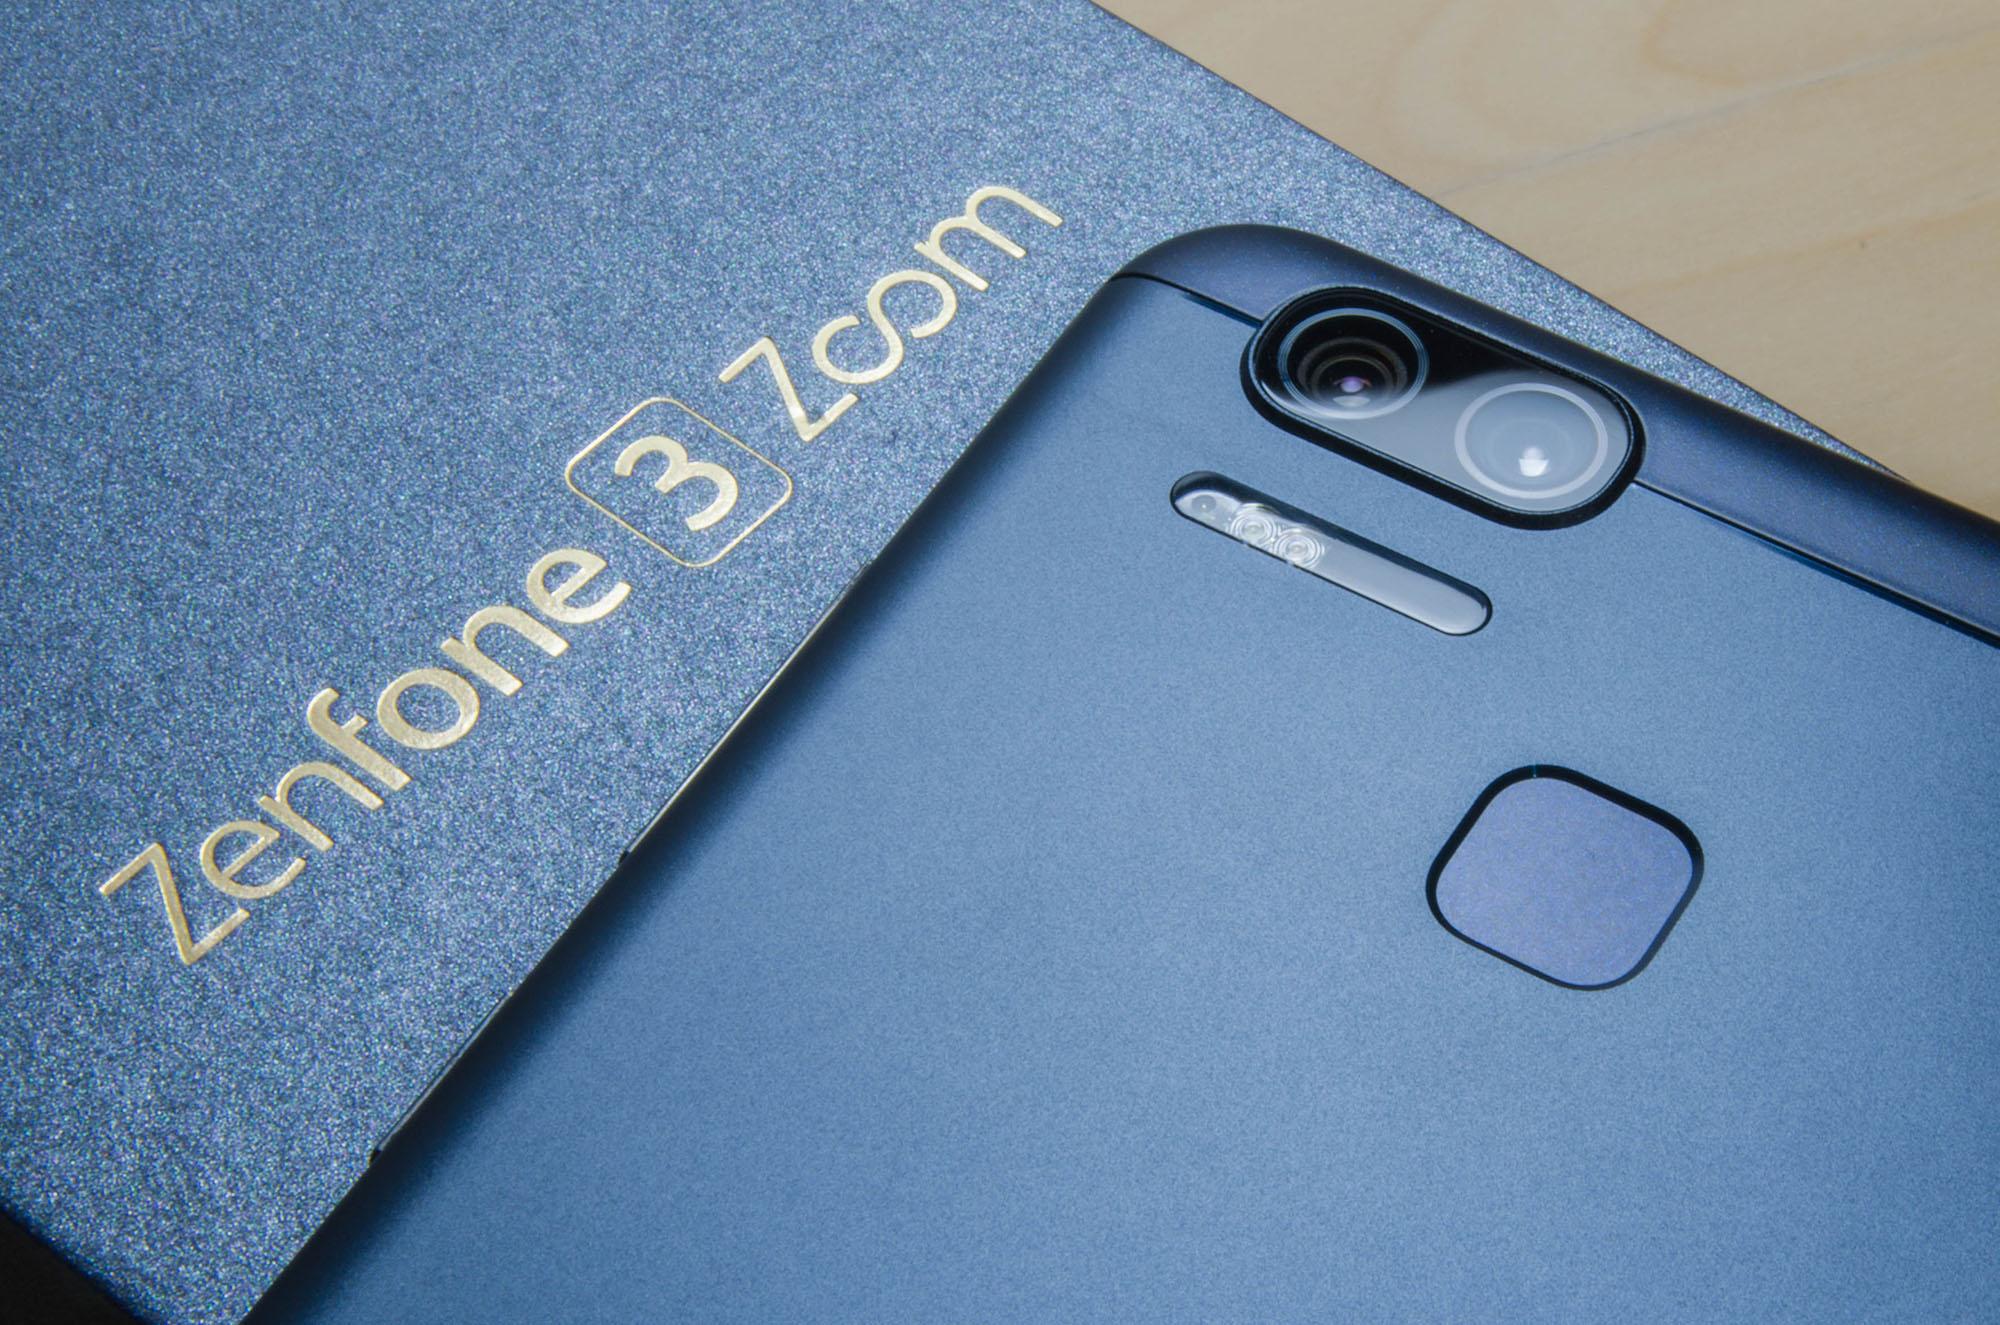 камерофон, ASUS ZenFone 3 Zoom